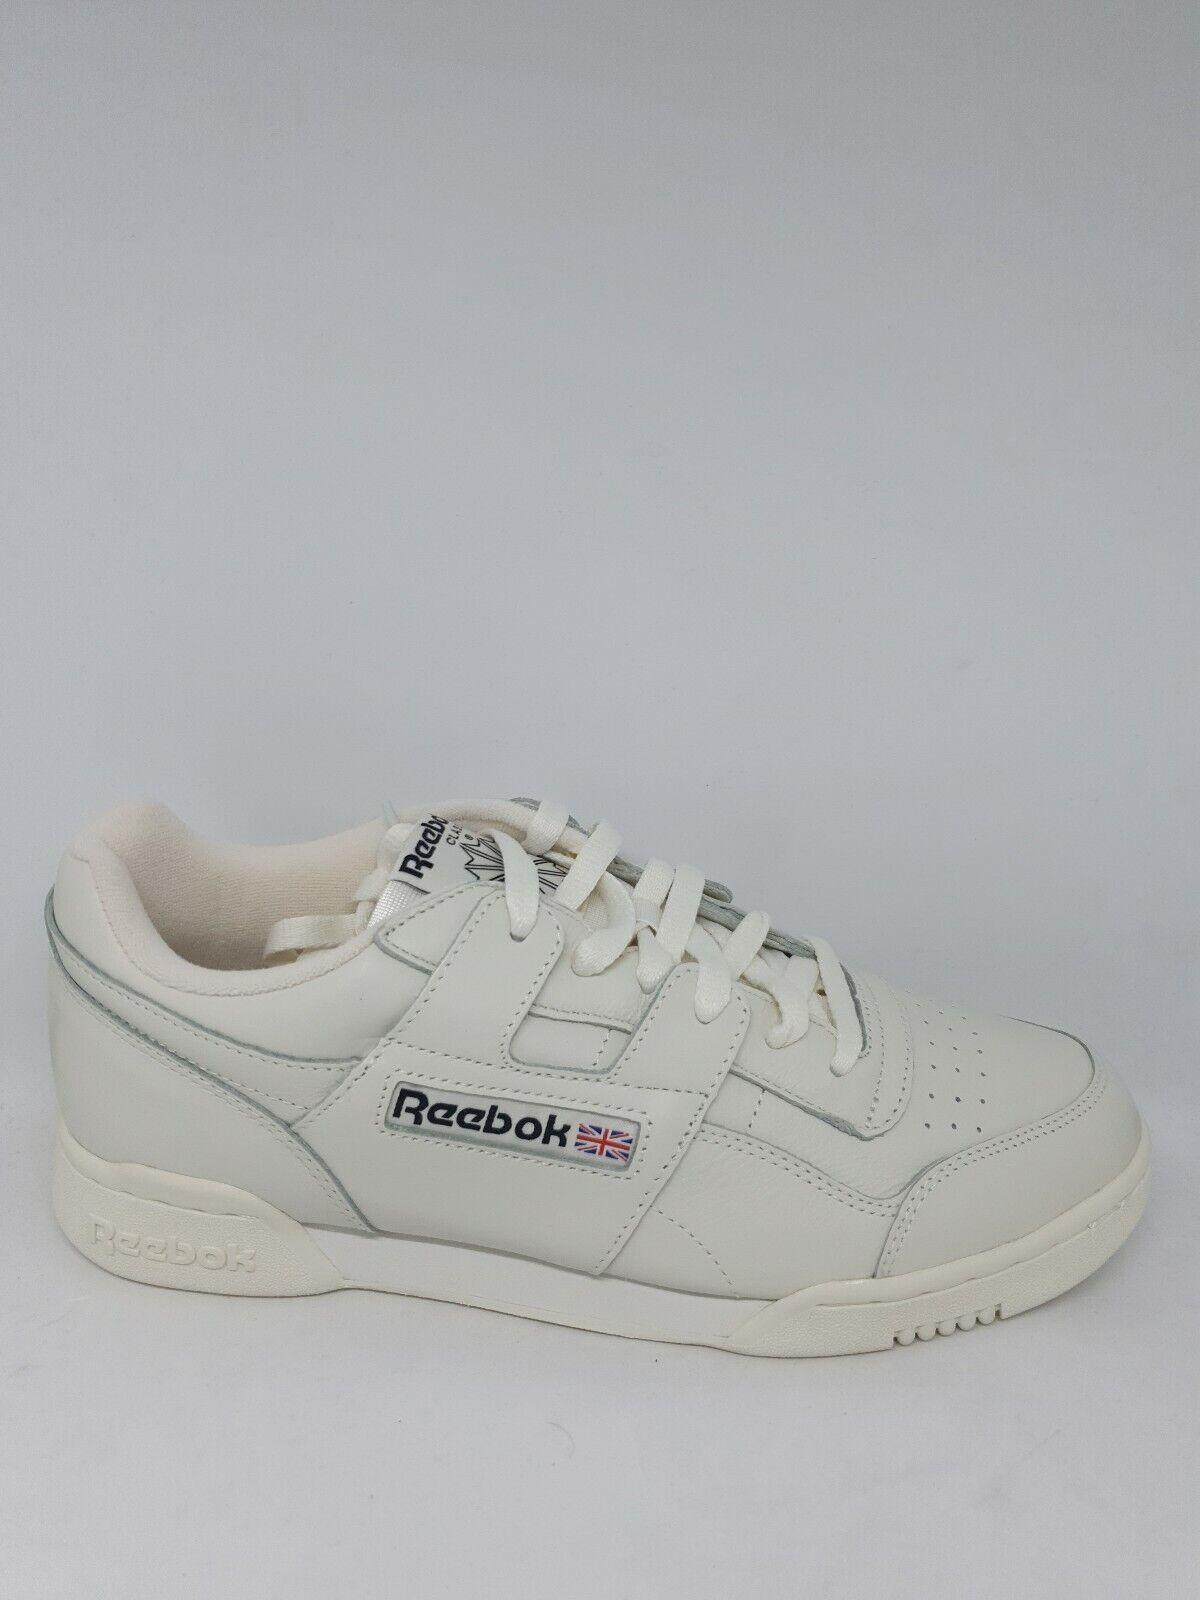 Reebok Workout plus mu cn4966 calcetines cortos zapatos cuero blancoo uk8, 5 talla 42,5 nuevo